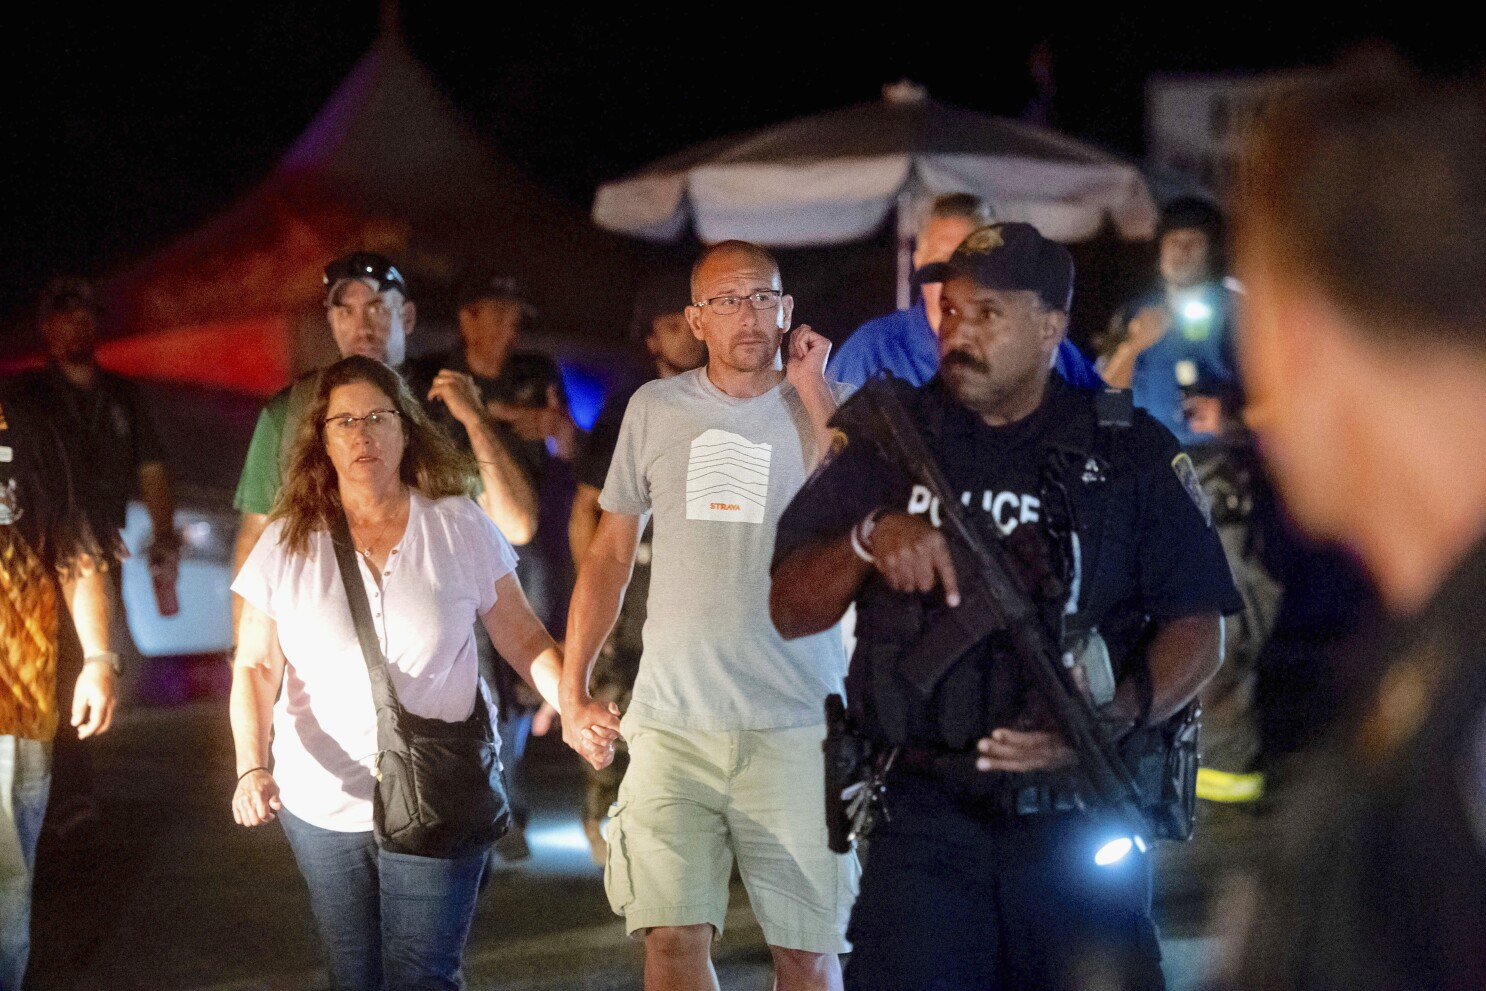 Gilroy shooter killed himself, coroner says, contradicting